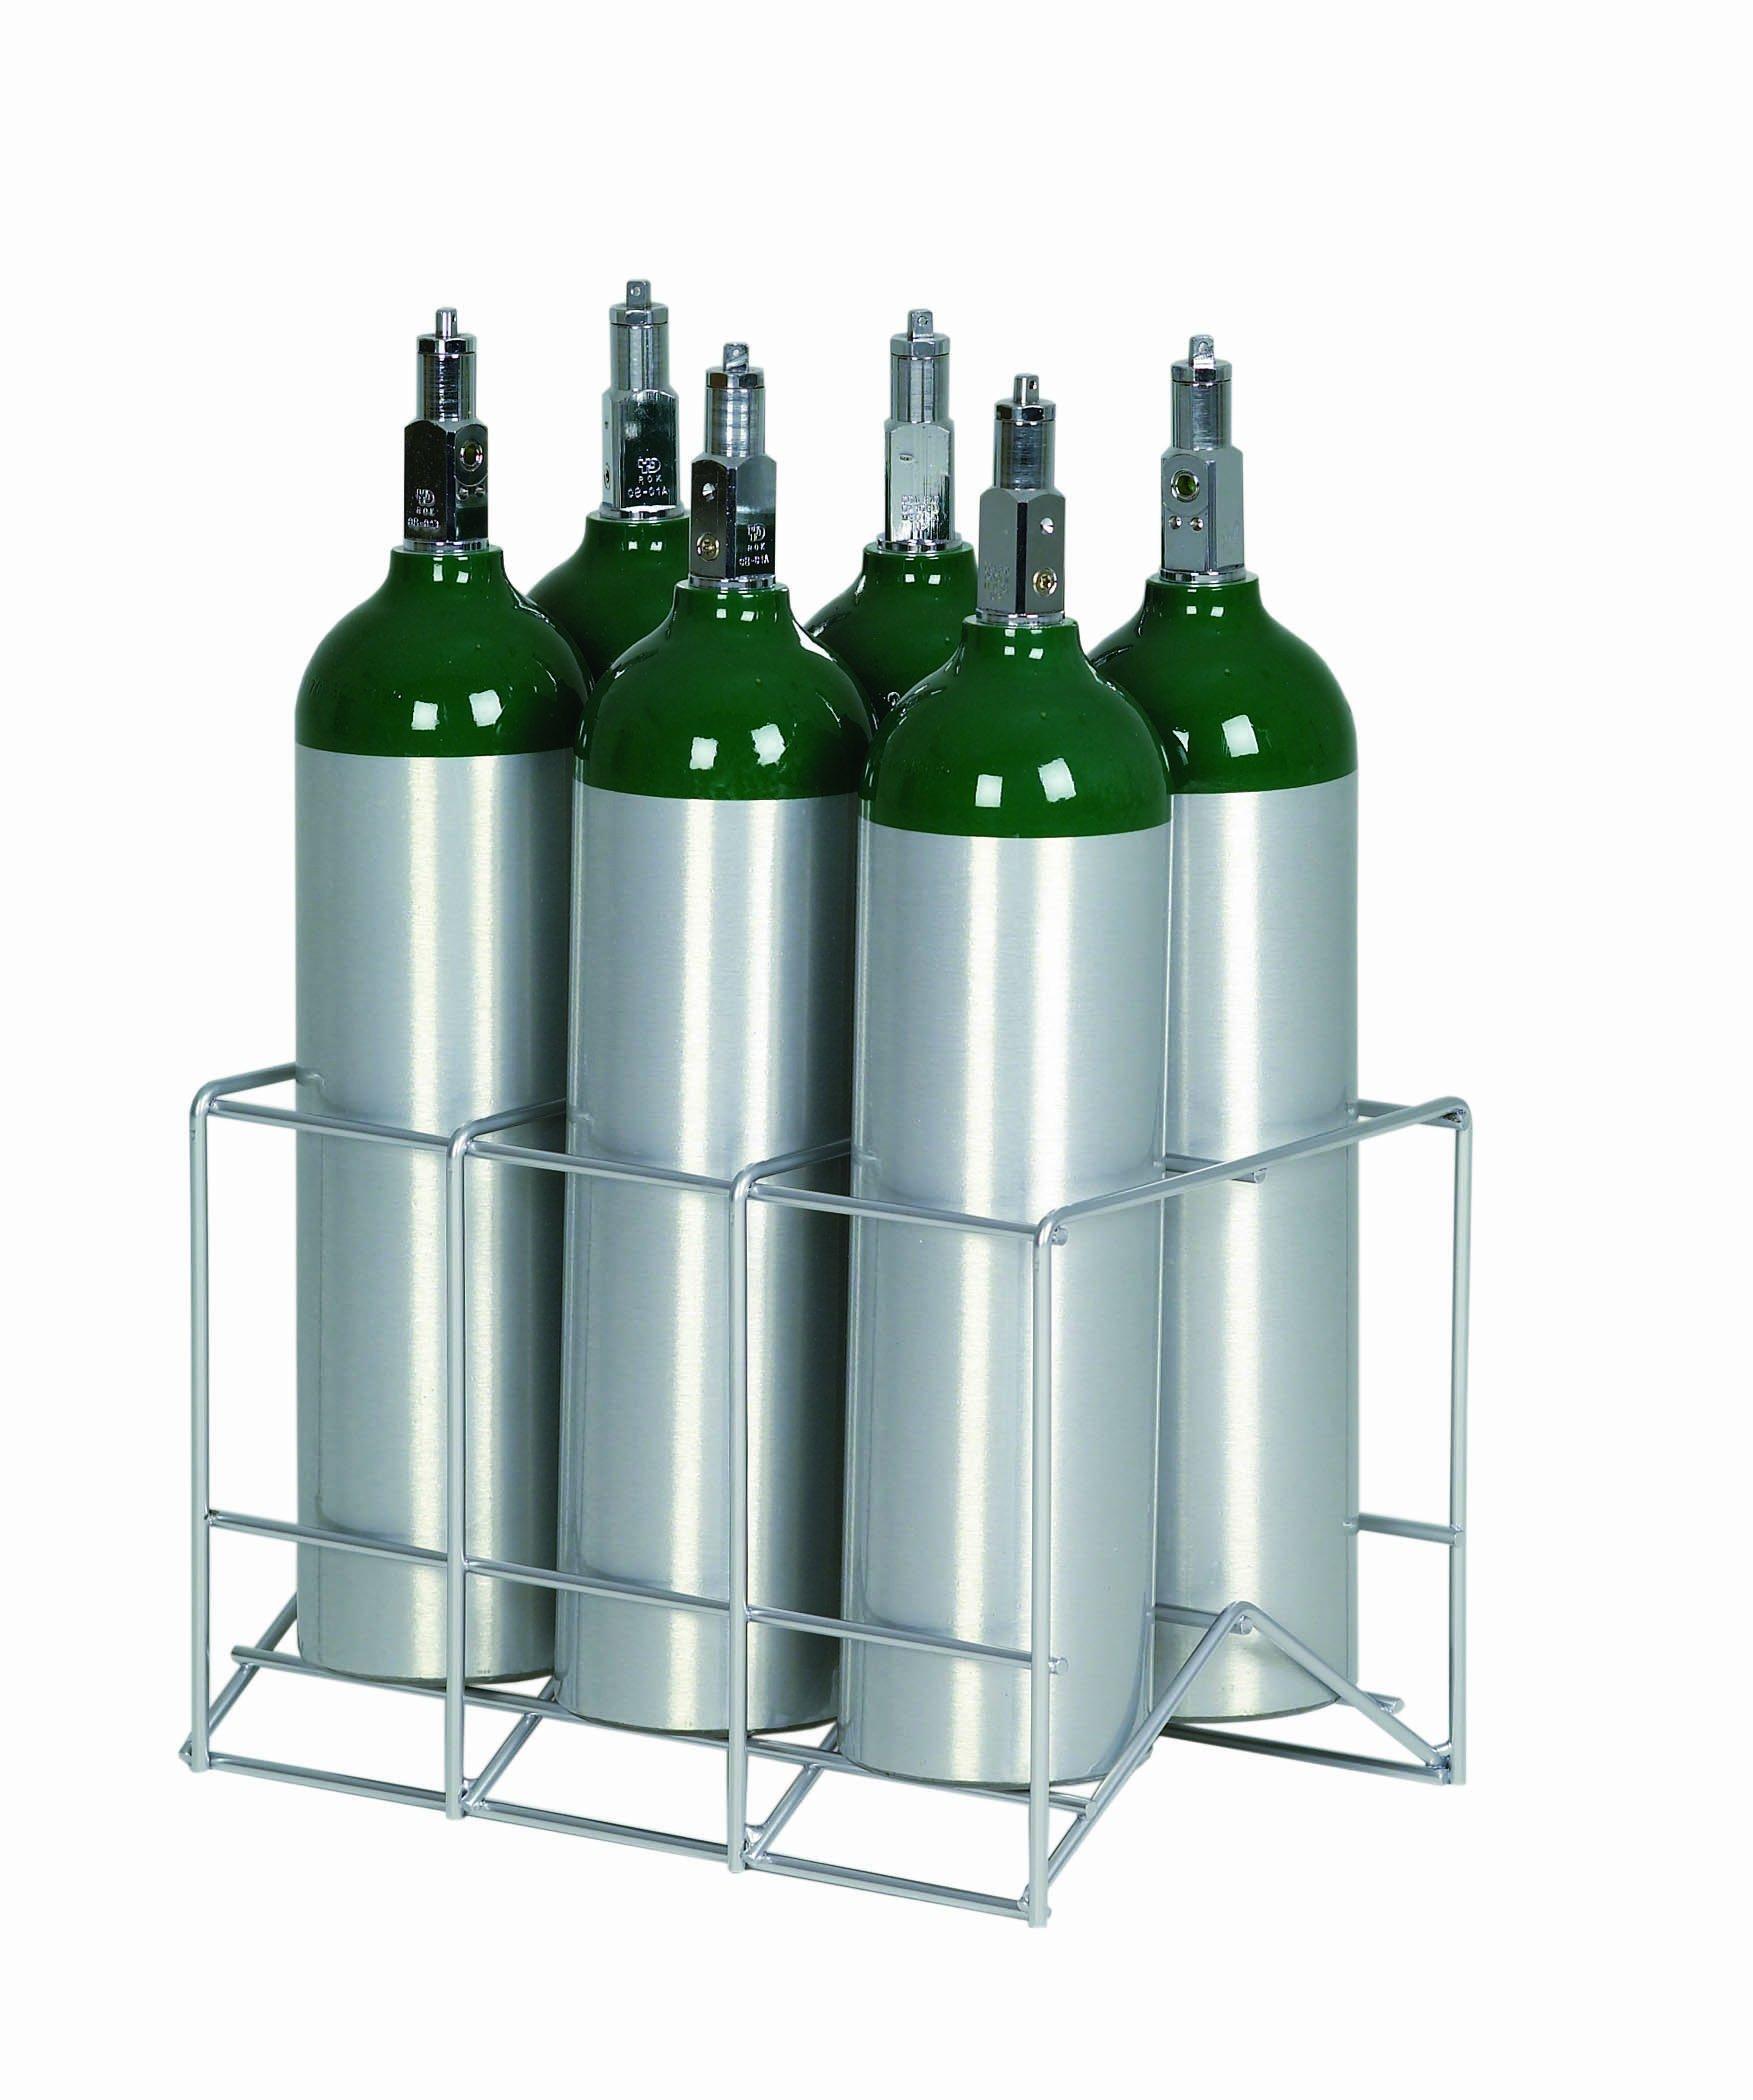 6 Cylinder Metal Rack for D / E / M9 Oxygen Cylinders